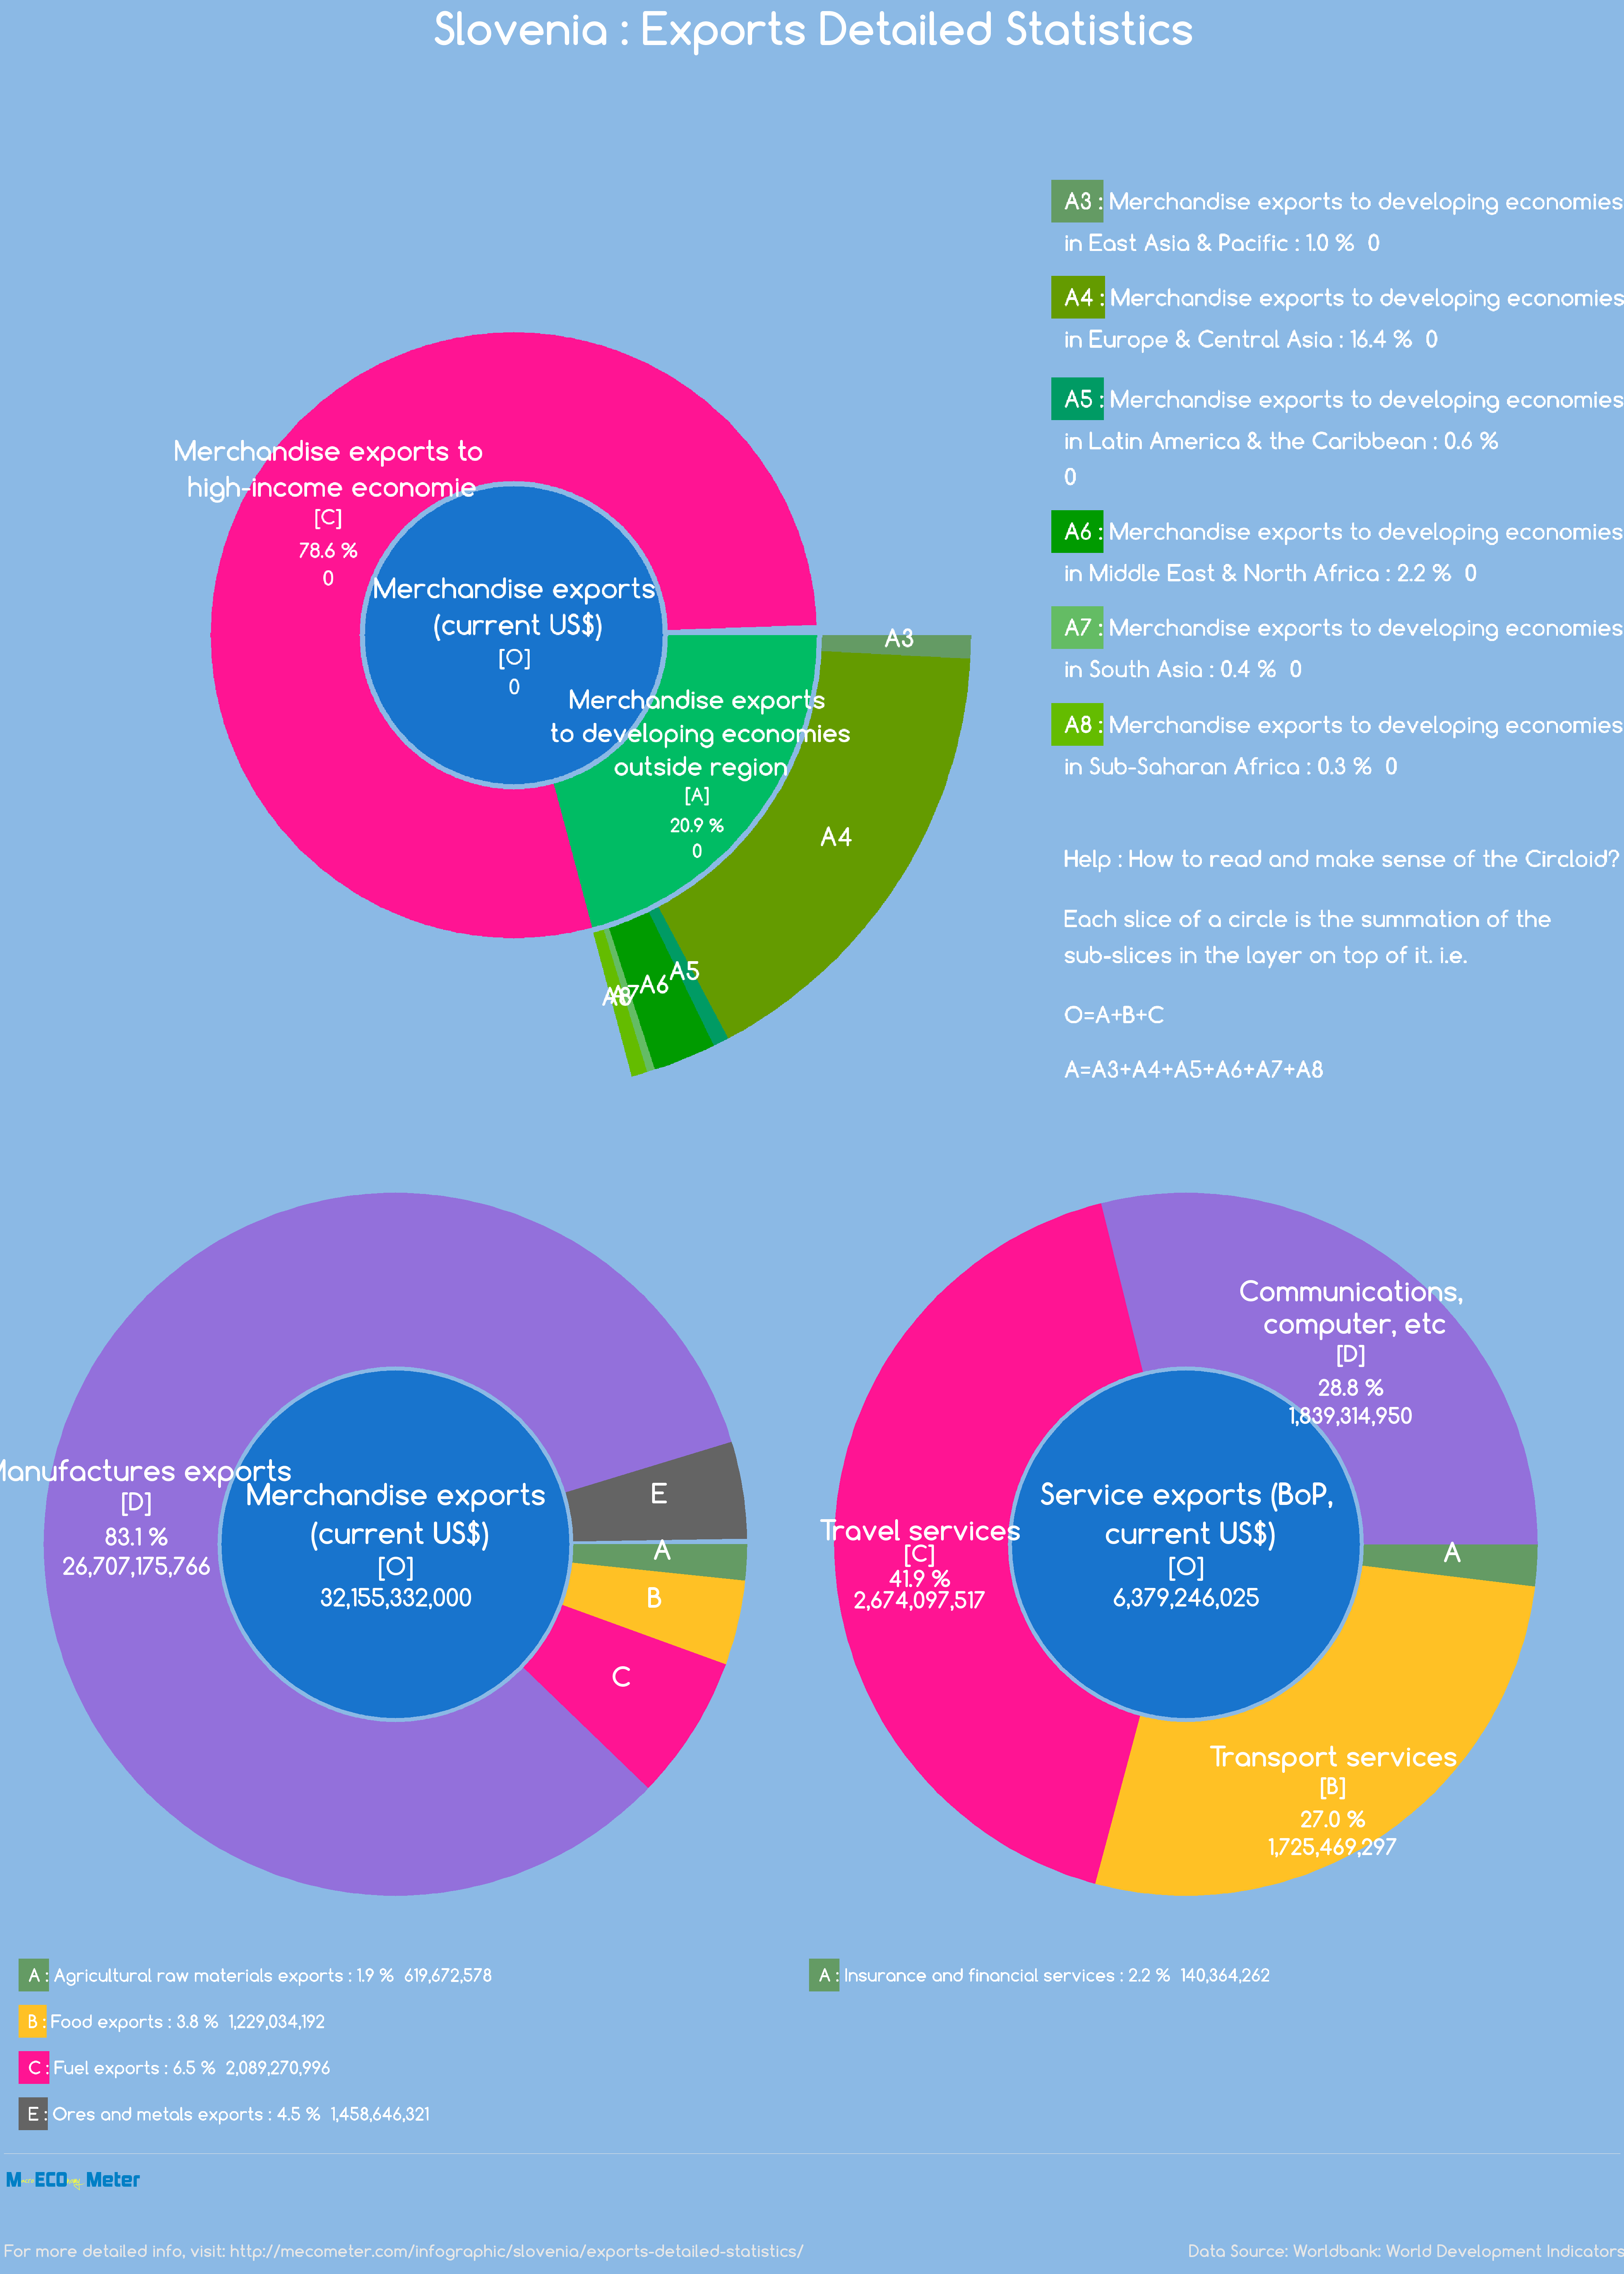 Slovenia : Exports Detailed Statistics